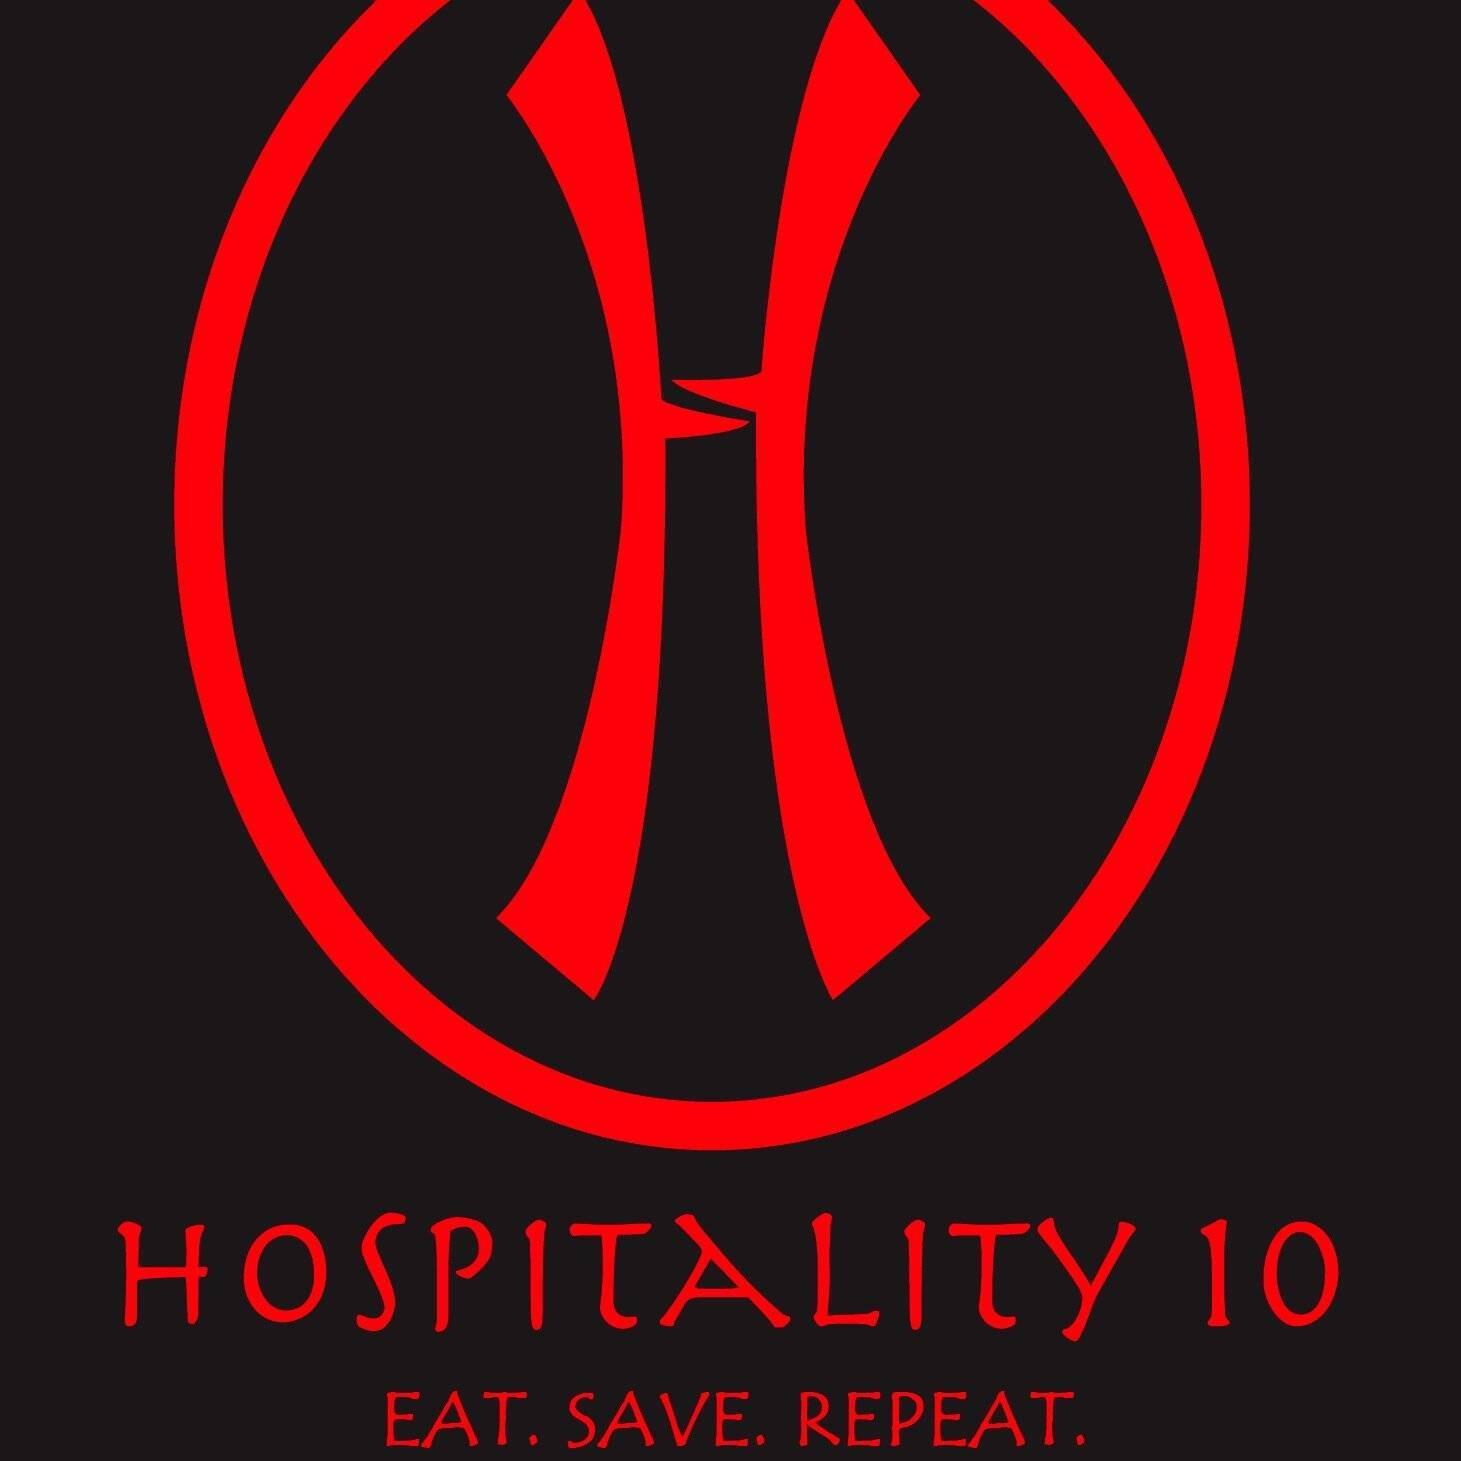 6d34de5dc32094696c33_Hospitality_10.jpeg